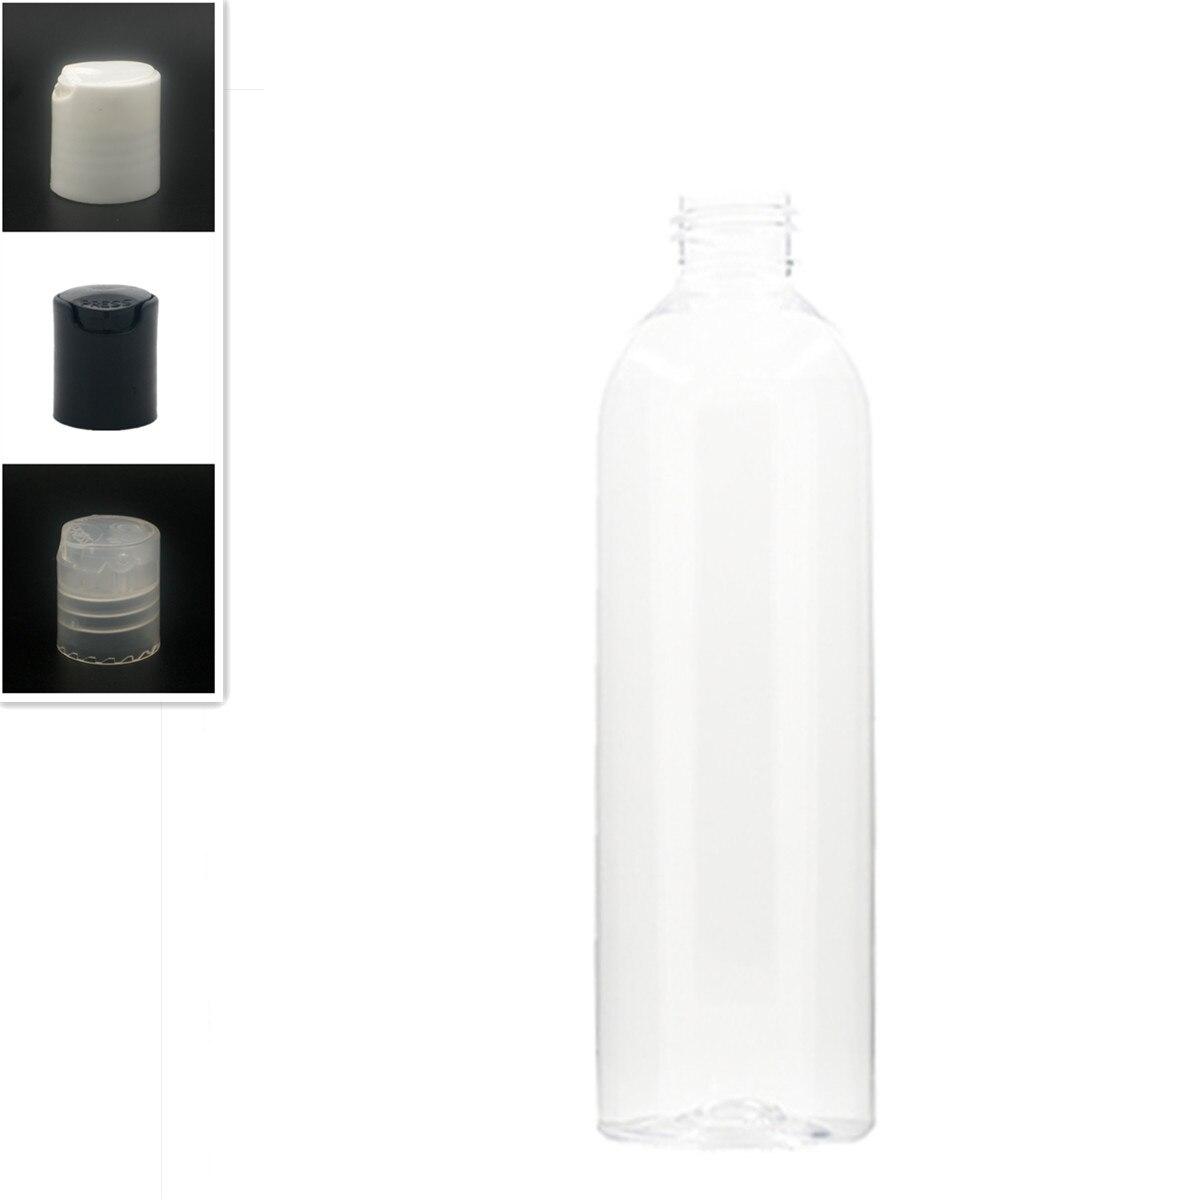 250 мл пустая круглая пластиковая бутылка cosmo, прозрачная ПЭТ бутылка с белым/черным дисковым верхом